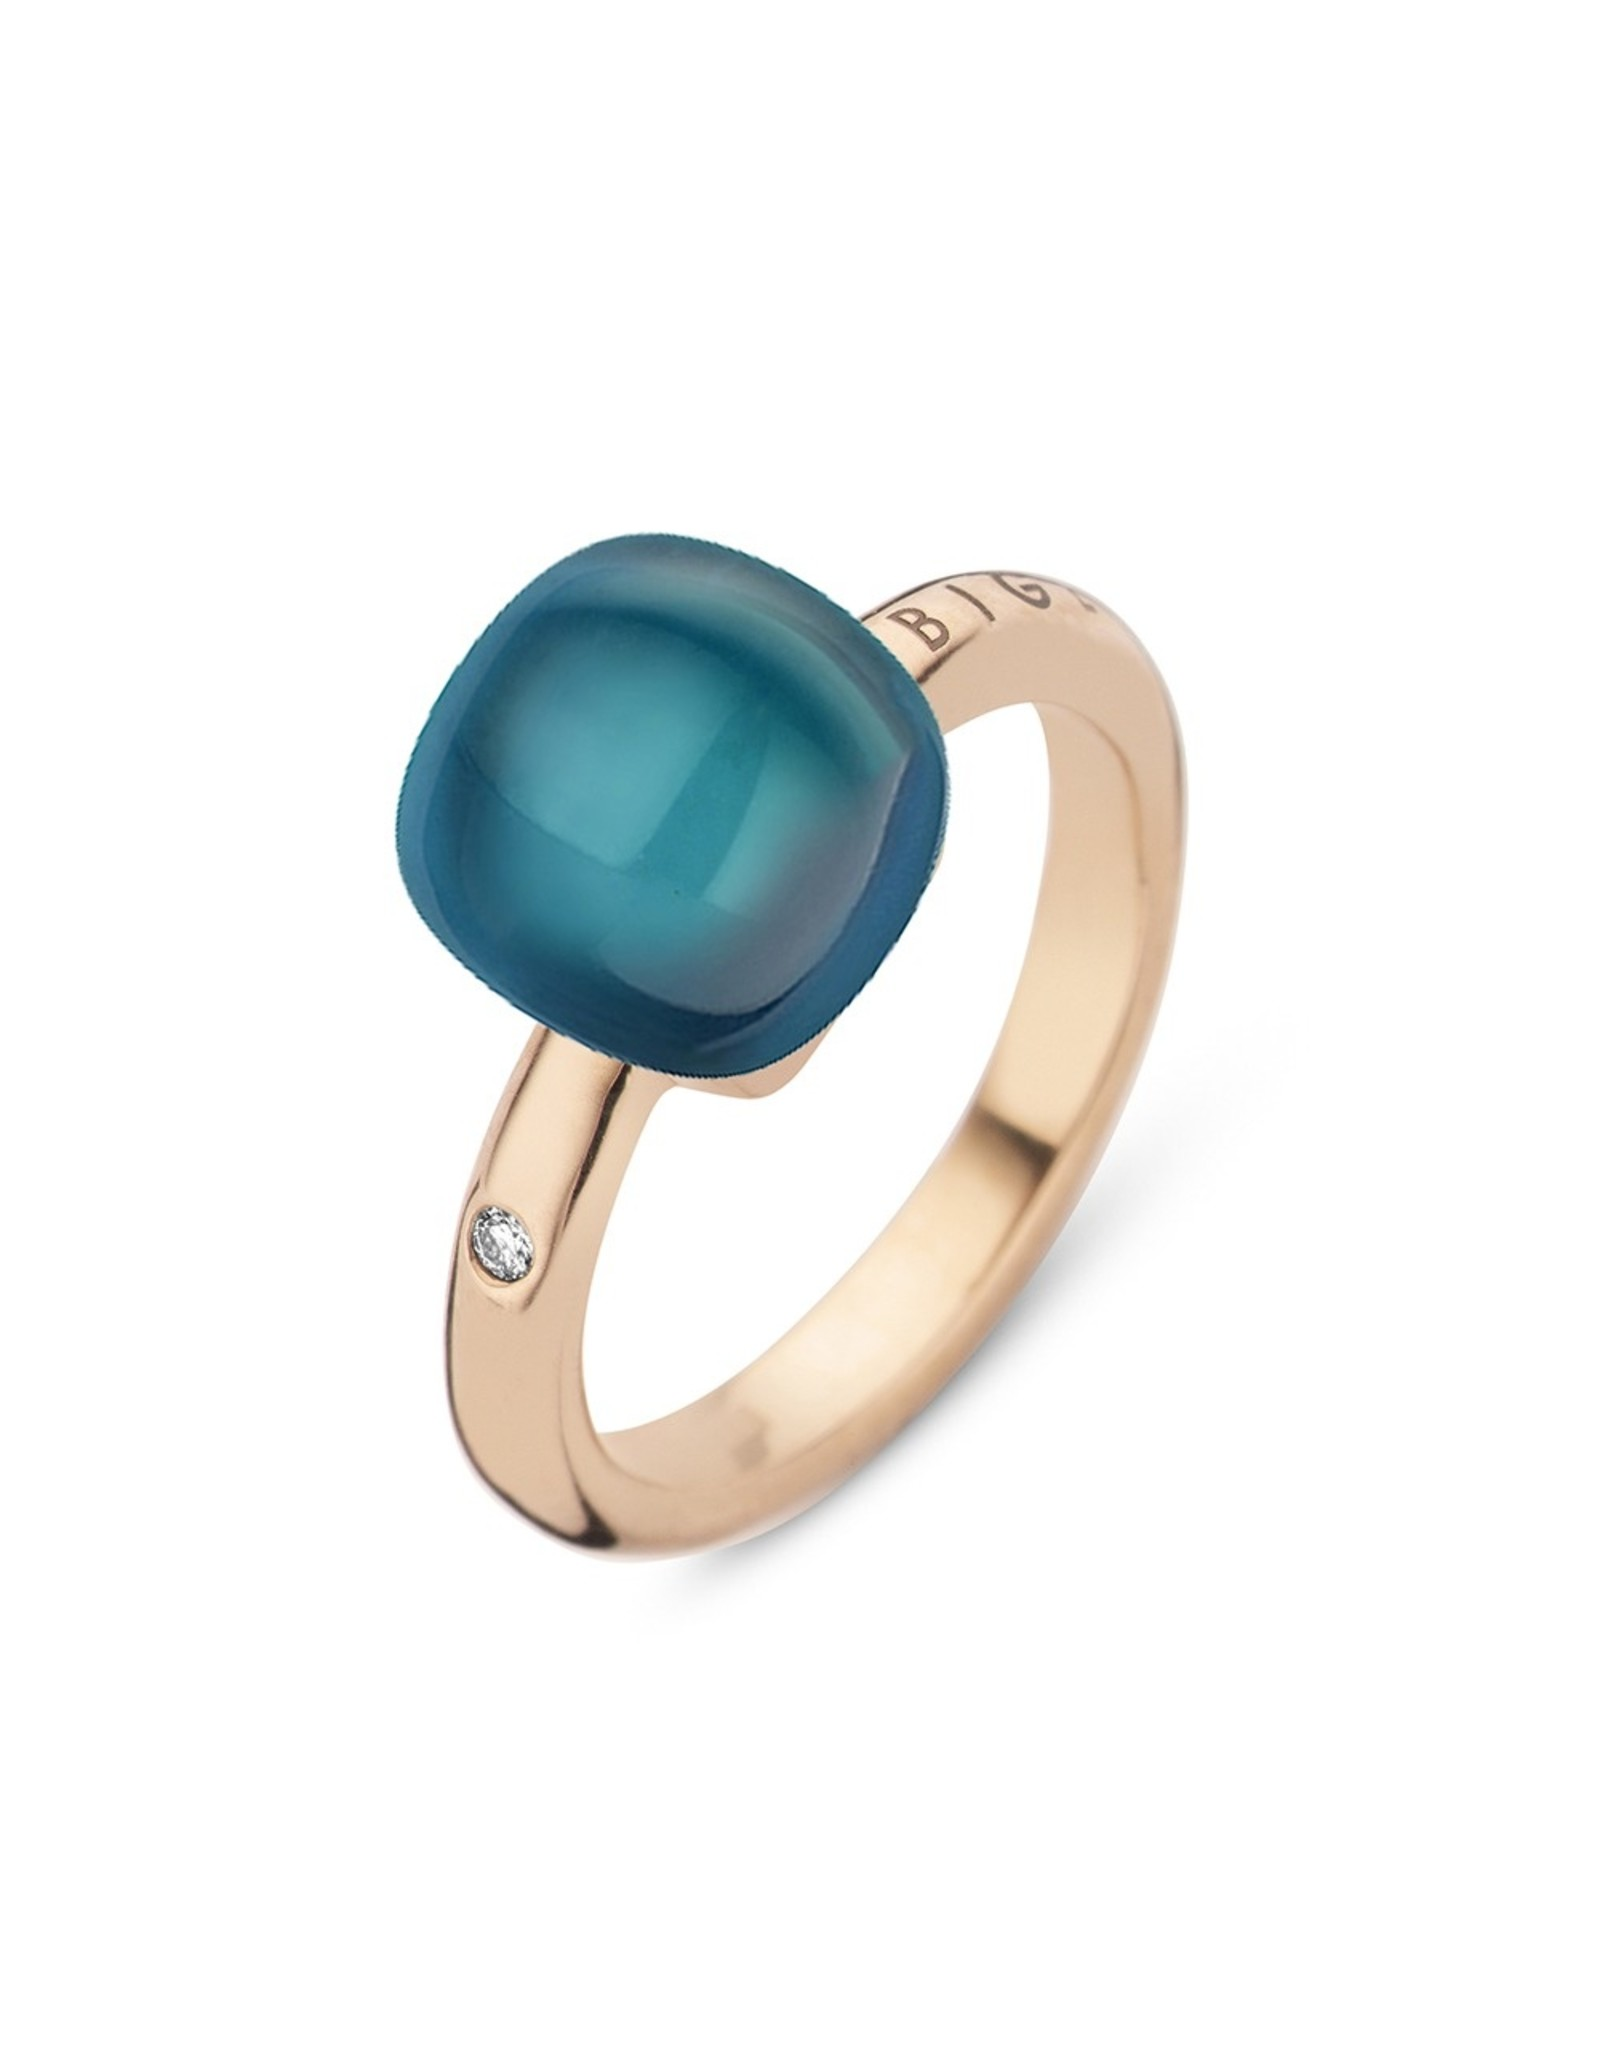 Bigli Ring Mini Sweety blauwe topaas en parelmoer